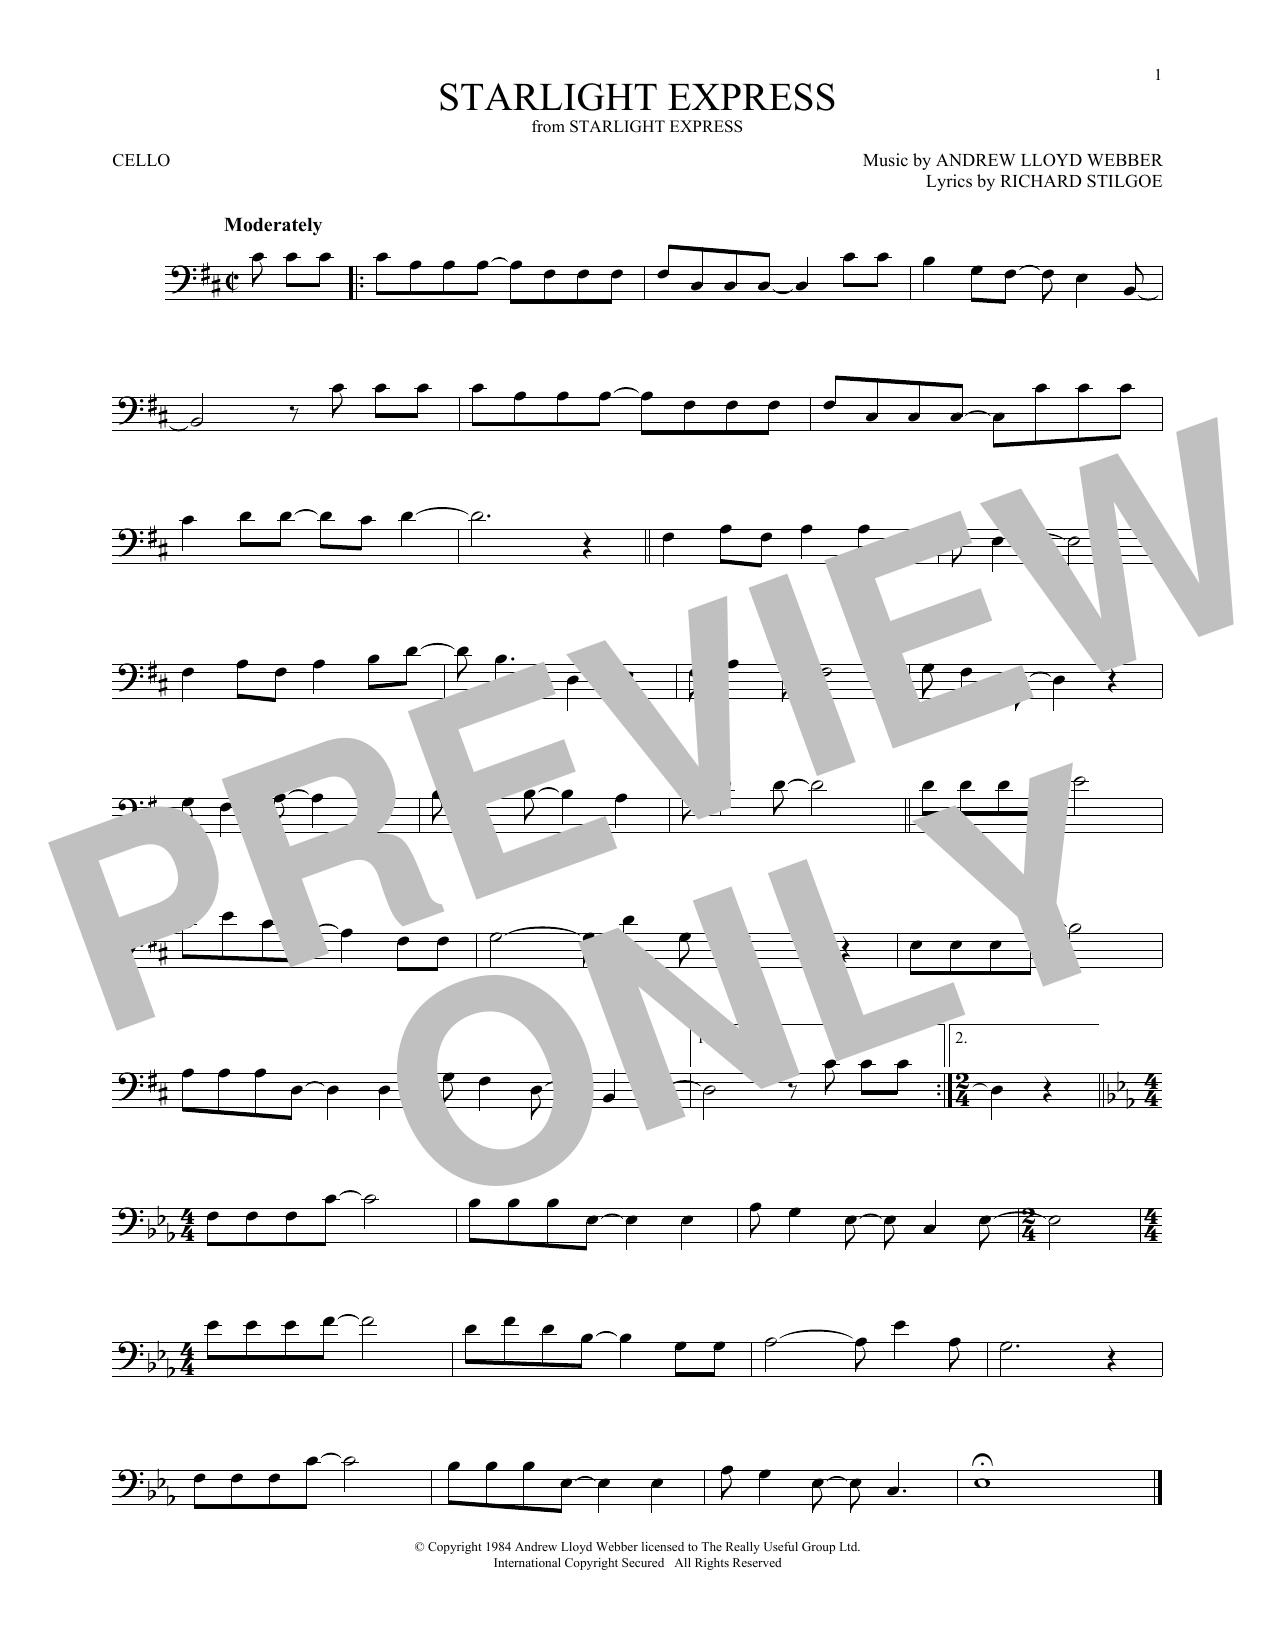 Starlight Express (Cello Solo)